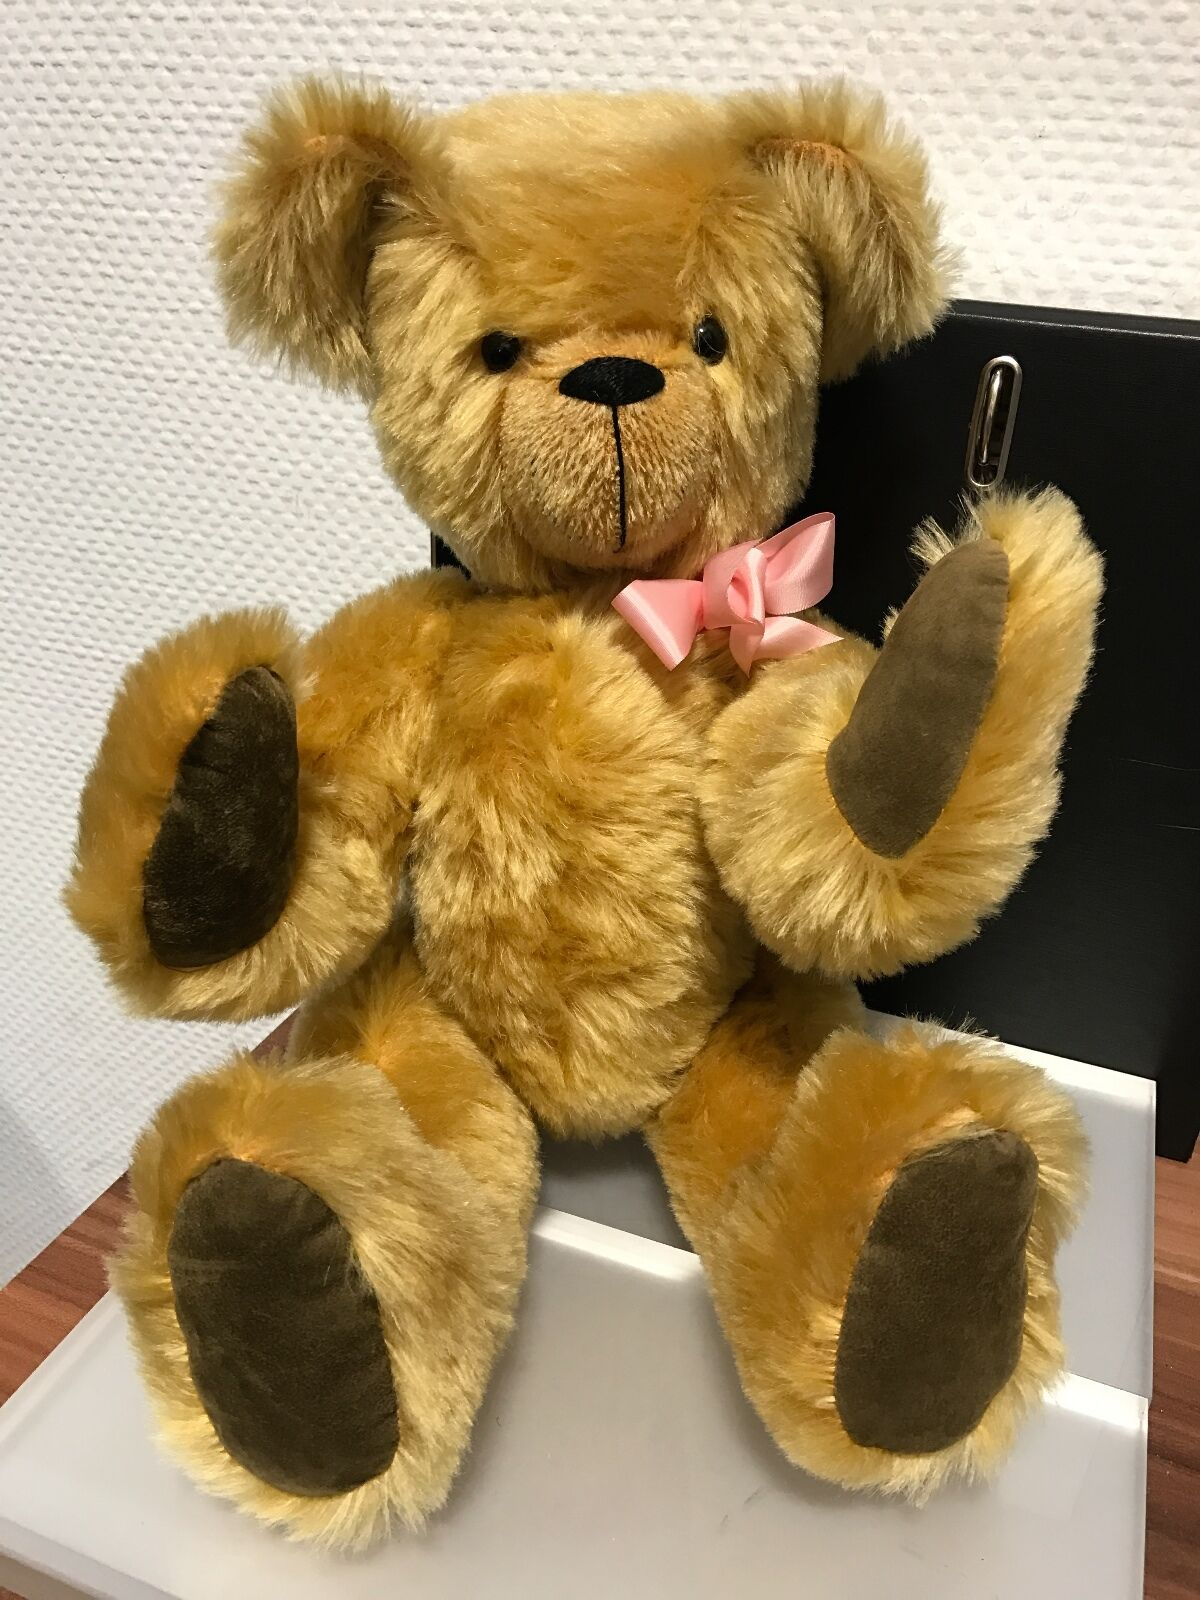 Hermann Teddy cm Bär 47 cm Teddy Top Zustand f04026